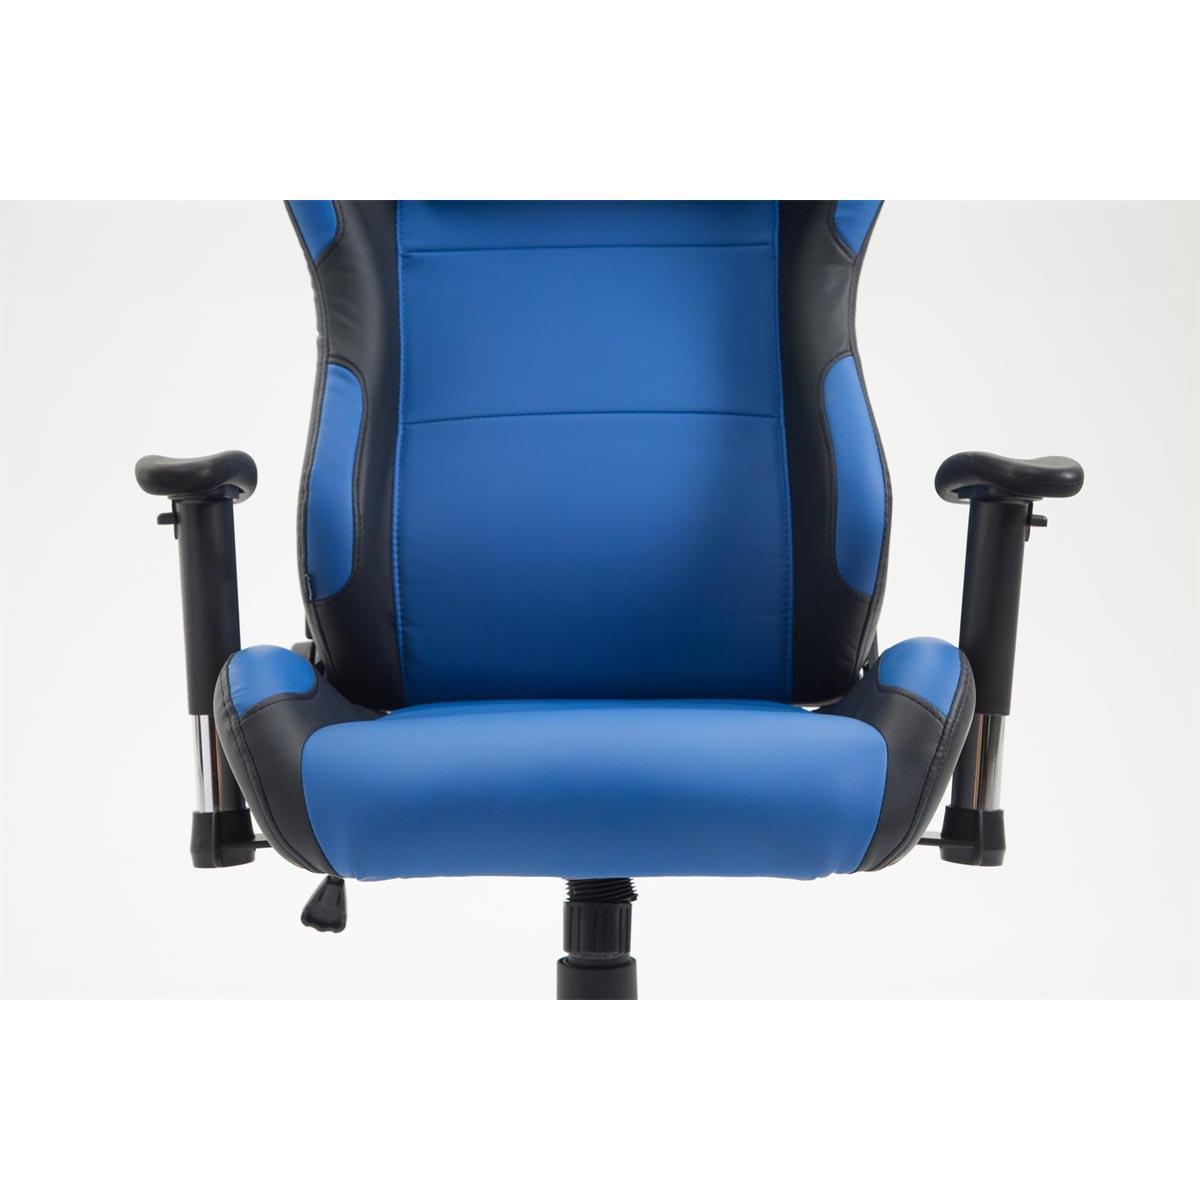 fauteuil gamer roby design sportif et grand confort en cuir bleu fauteuil gamer roby. Black Bedroom Furniture Sets. Home Design Ideas